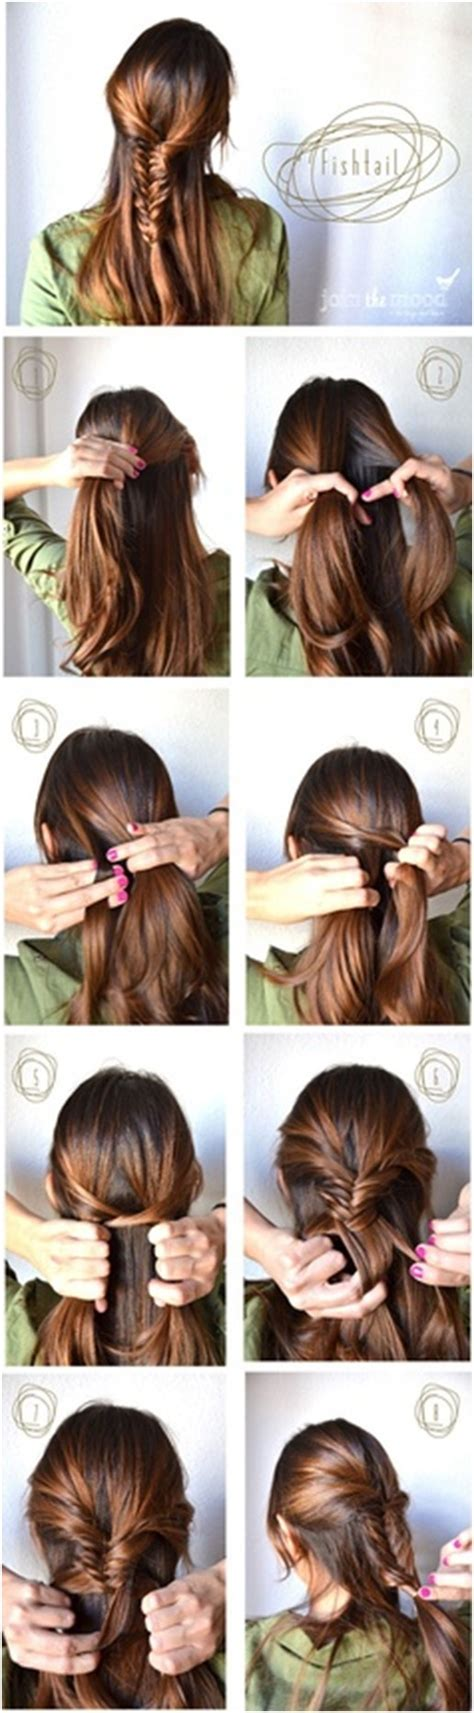 fishtail braided hairstyles tutorials trendy hairstyles